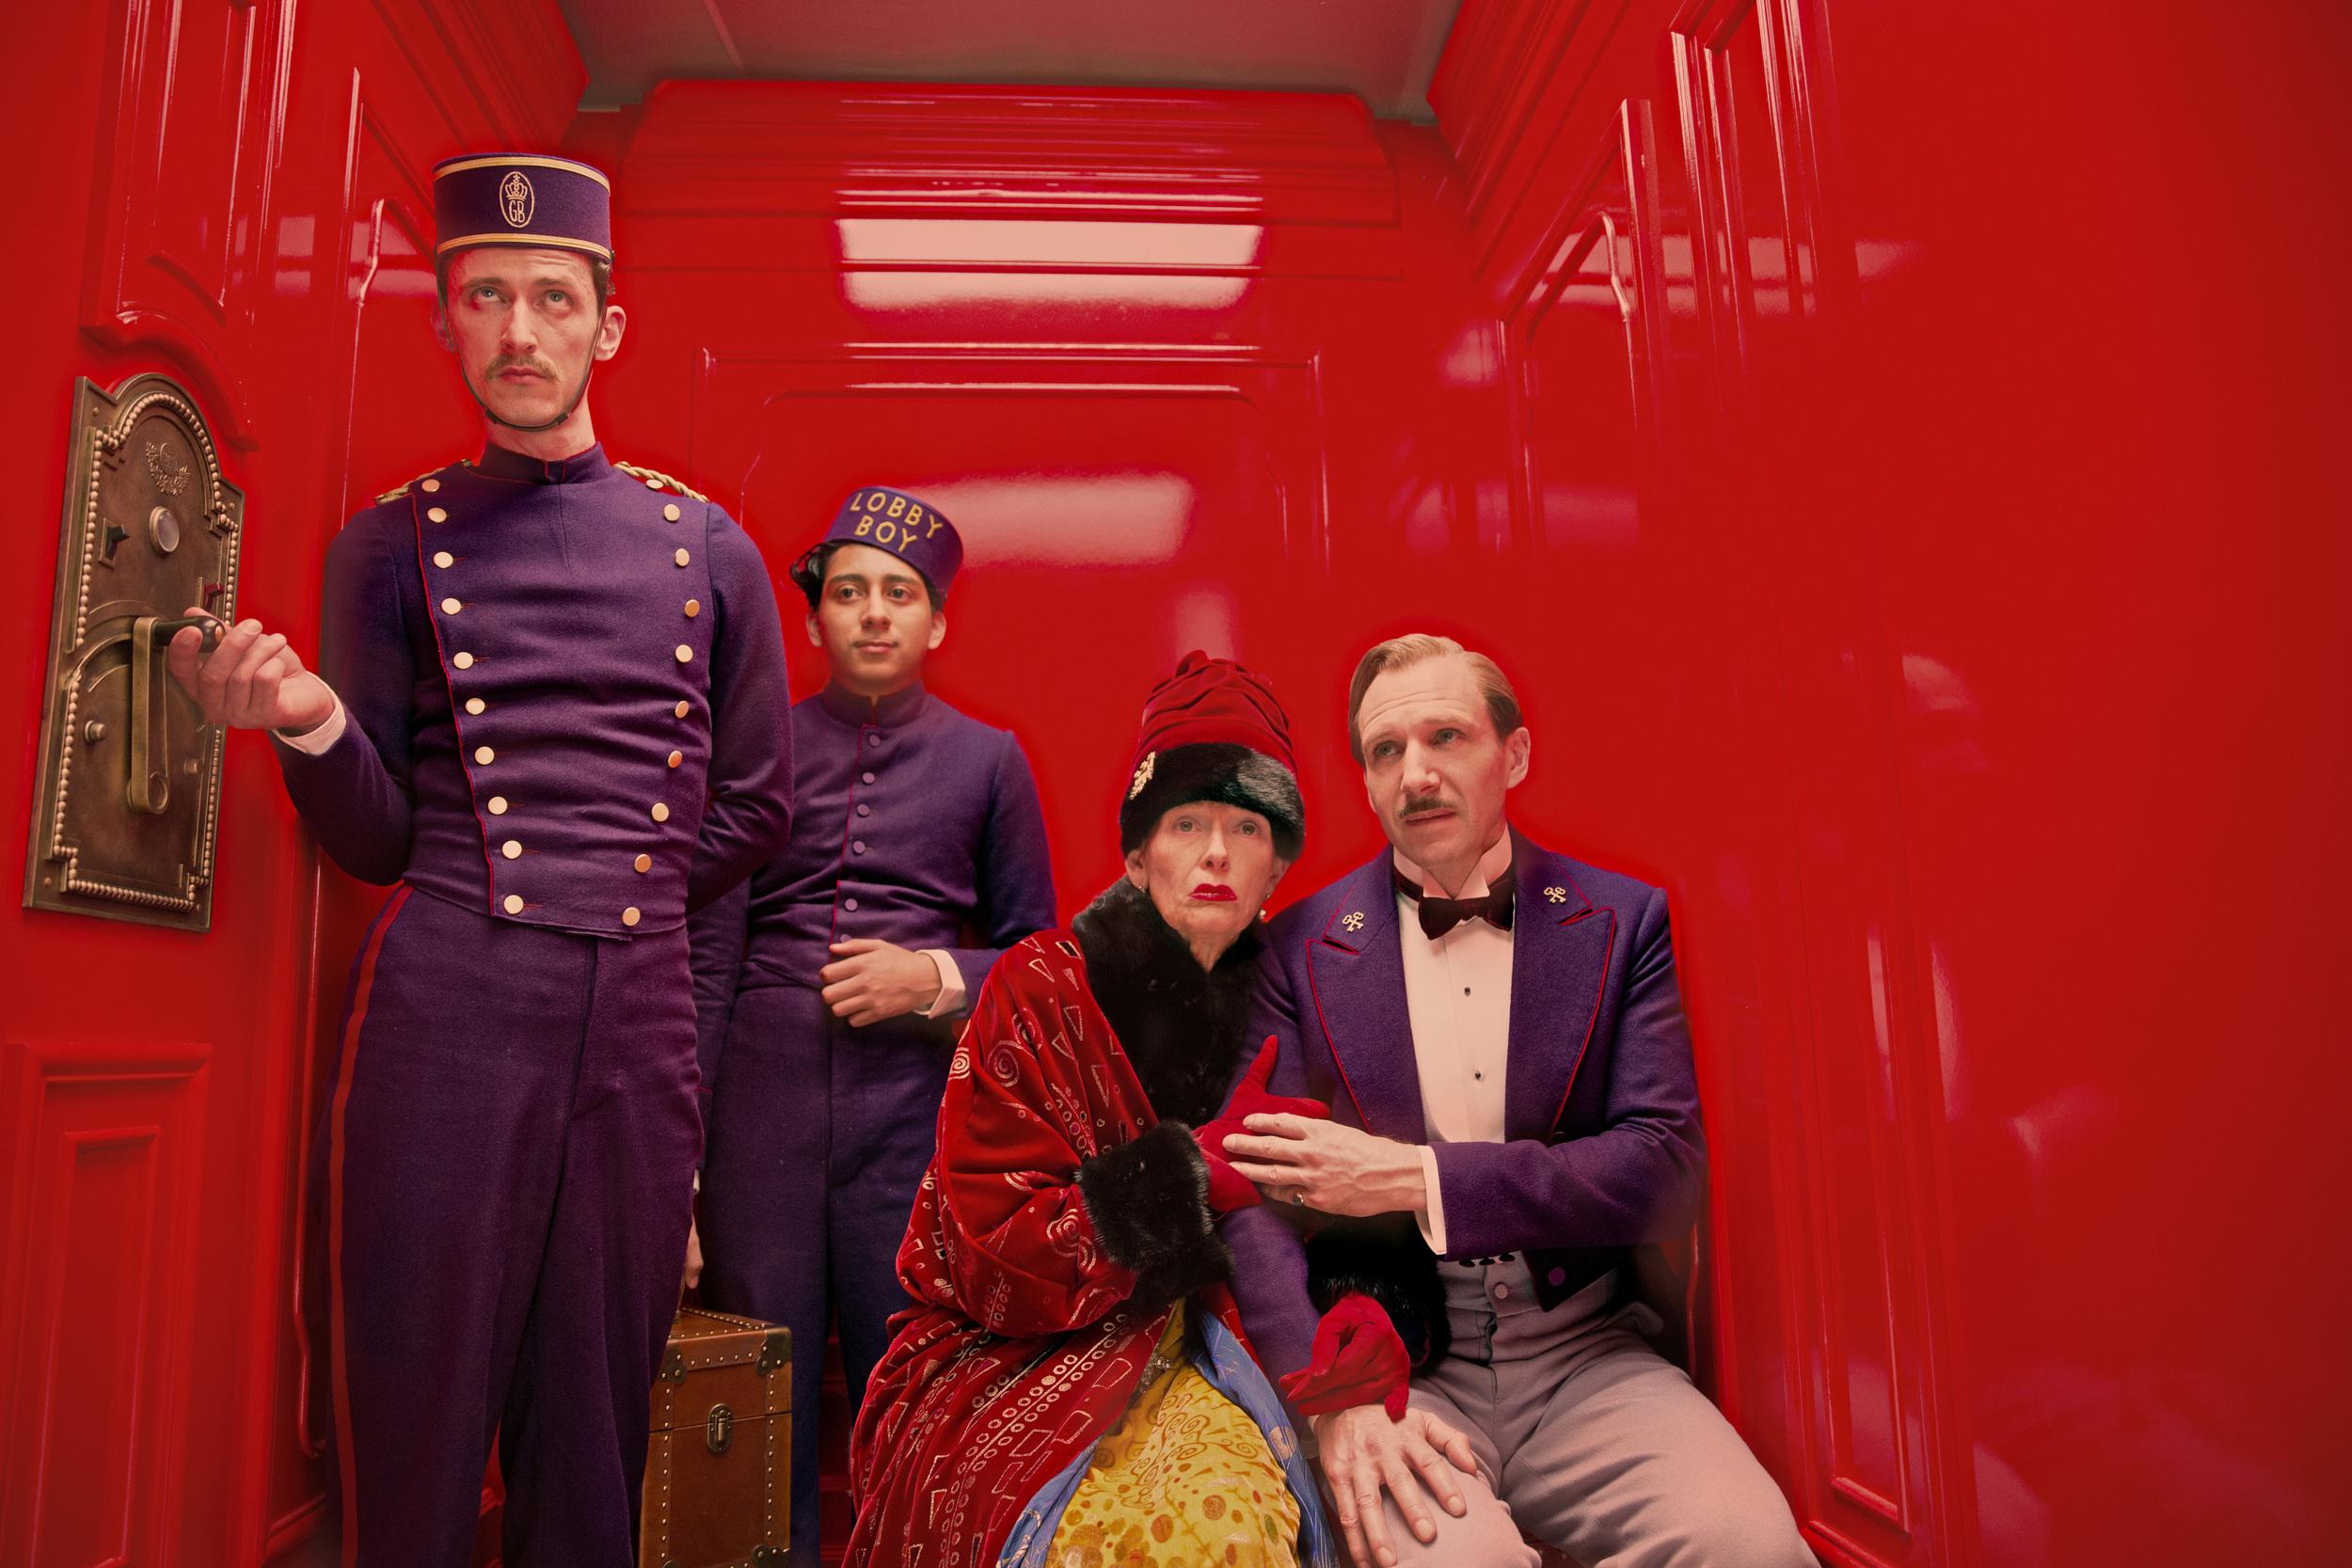 The Grand Budapest HotelRegisseurs/Director: Wes AndersonsDarsteller/Cast: Paul Schlase (Igor), Tony Revolori (Zero Moustafa), Tilda Swinton (Madame D.), Ralph Fiennes (M. Gustave)